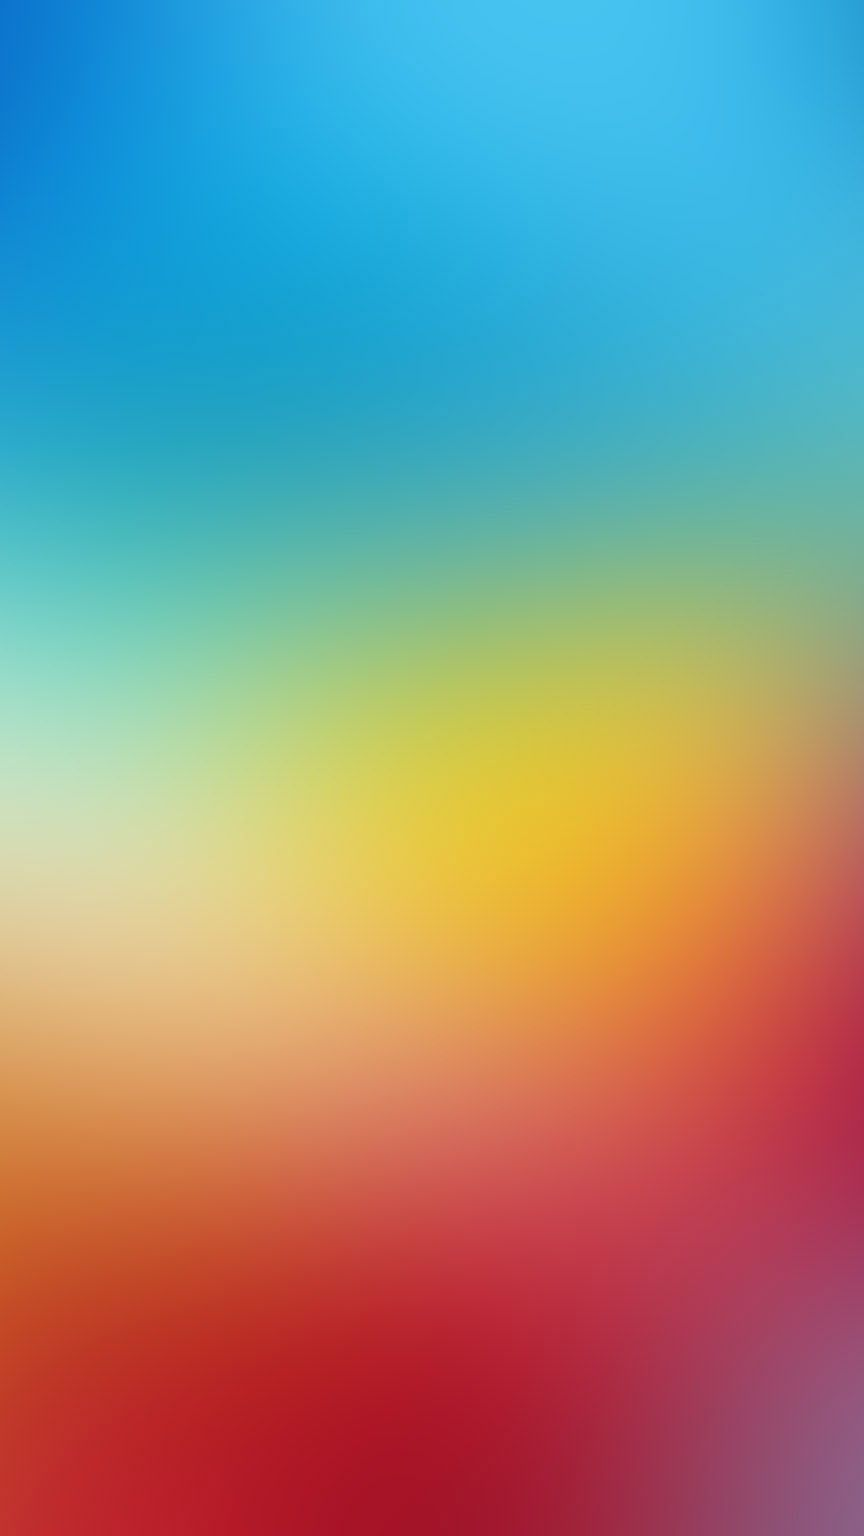 Blur Iphone Wallpapers Wallpaper Cave